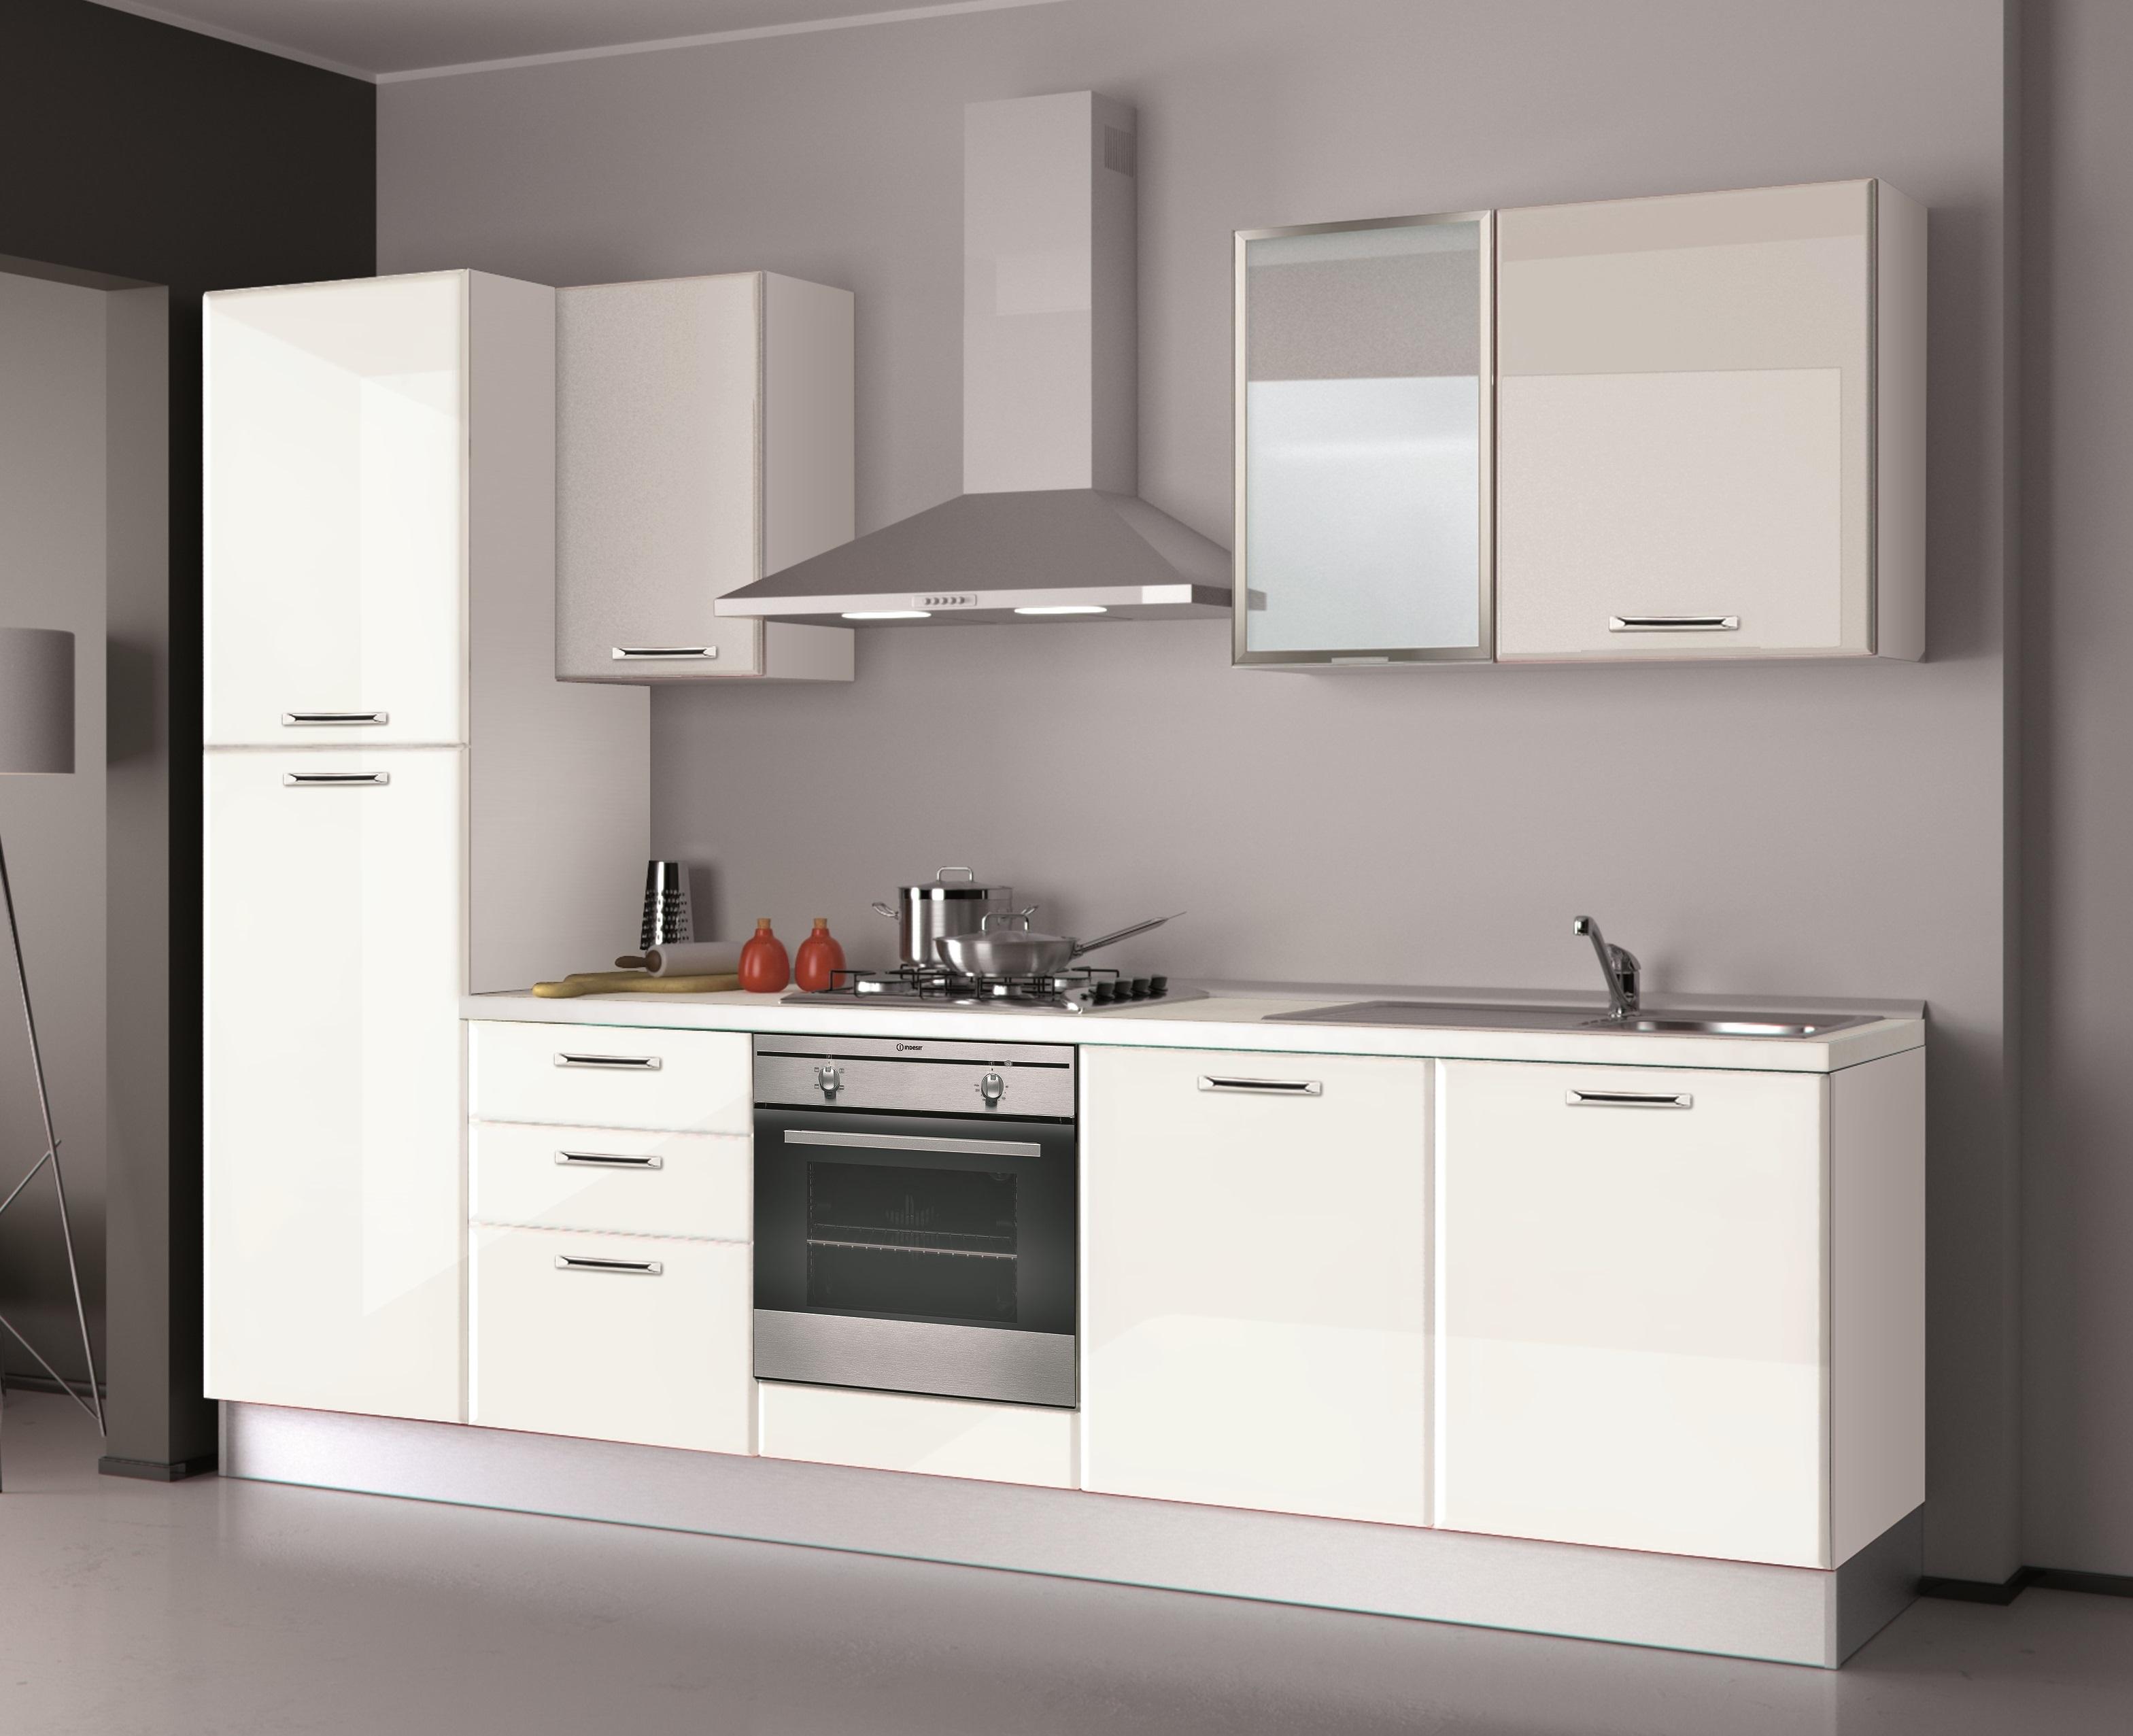 Promo 111 arredamenti centro cucine battistelli eric - Cucina lineare 3 metri senza frigo ...